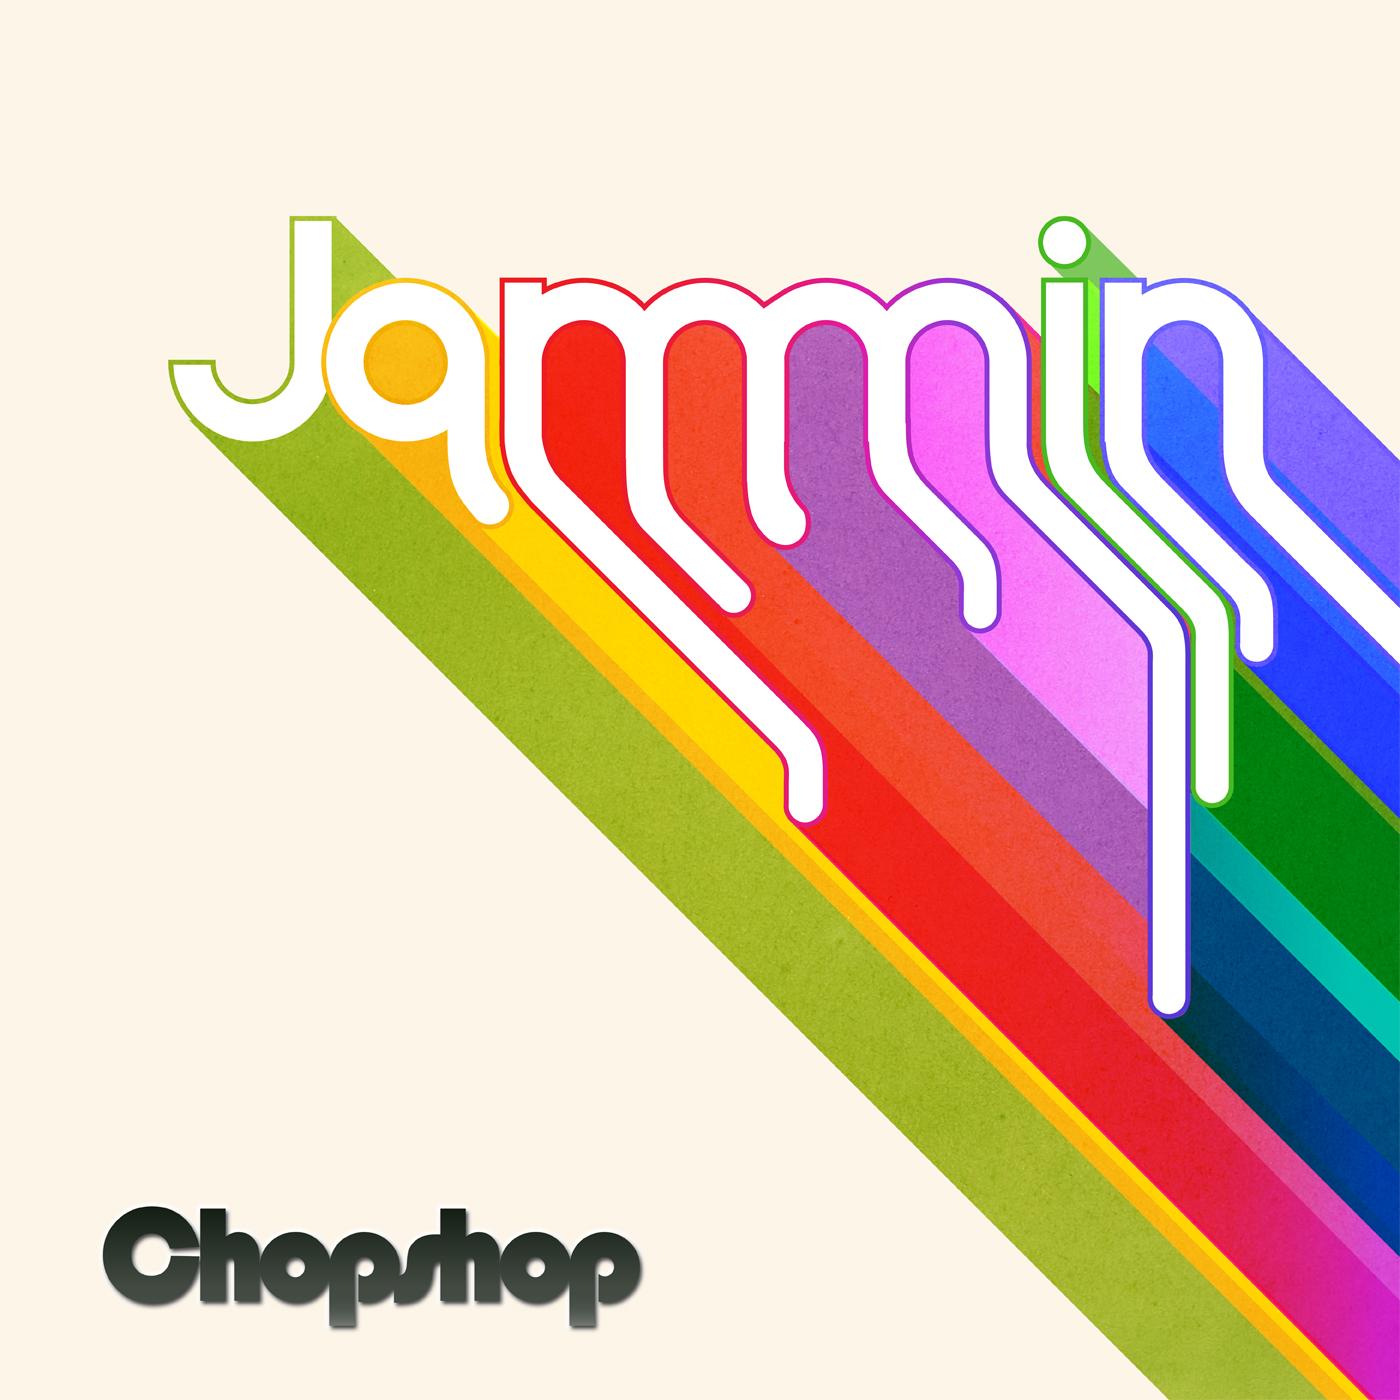 Summertime Groove Chopshop Leon Sweet